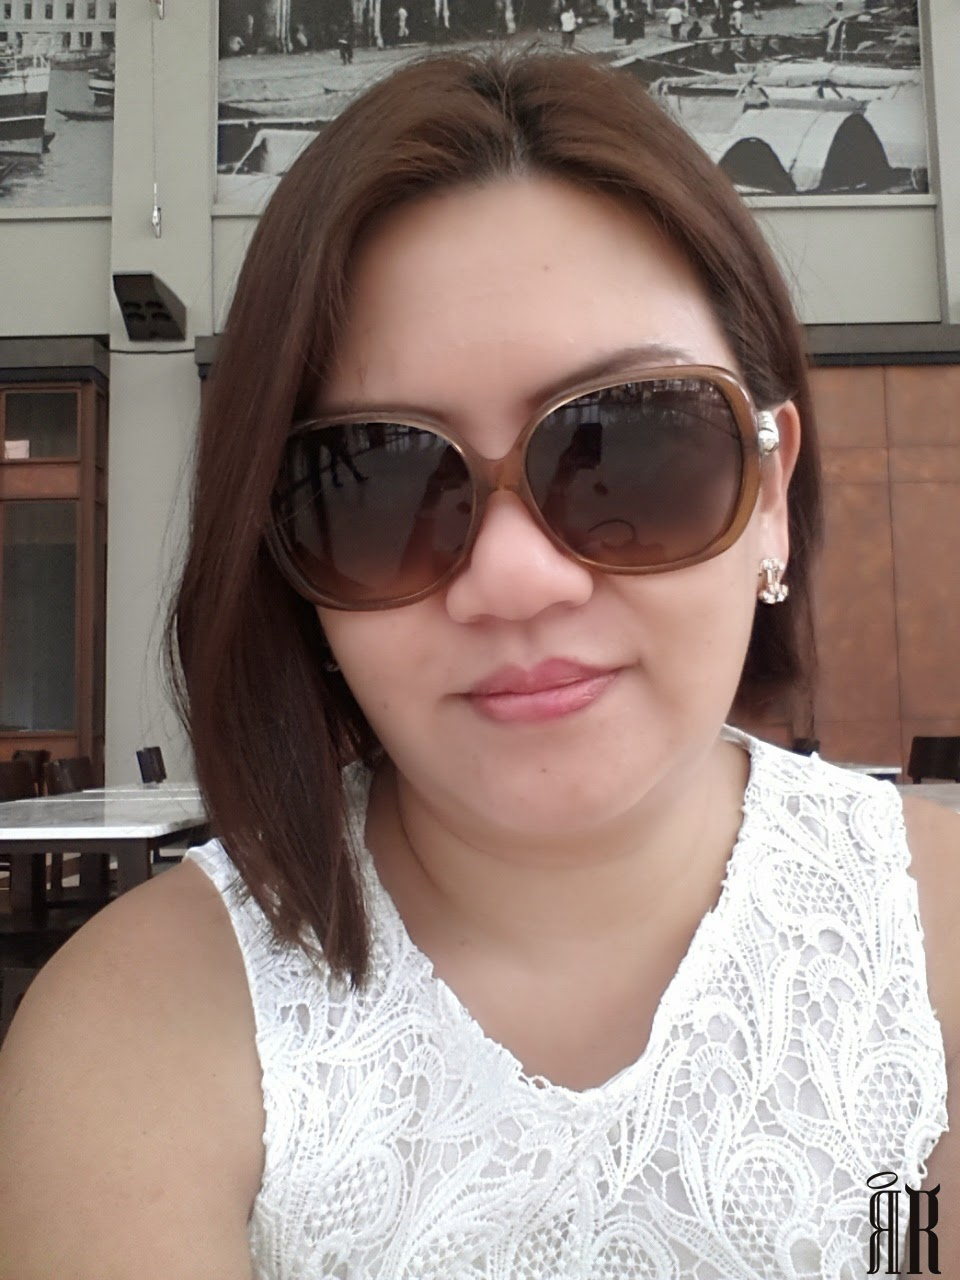 ShenWendys Wendy Shen